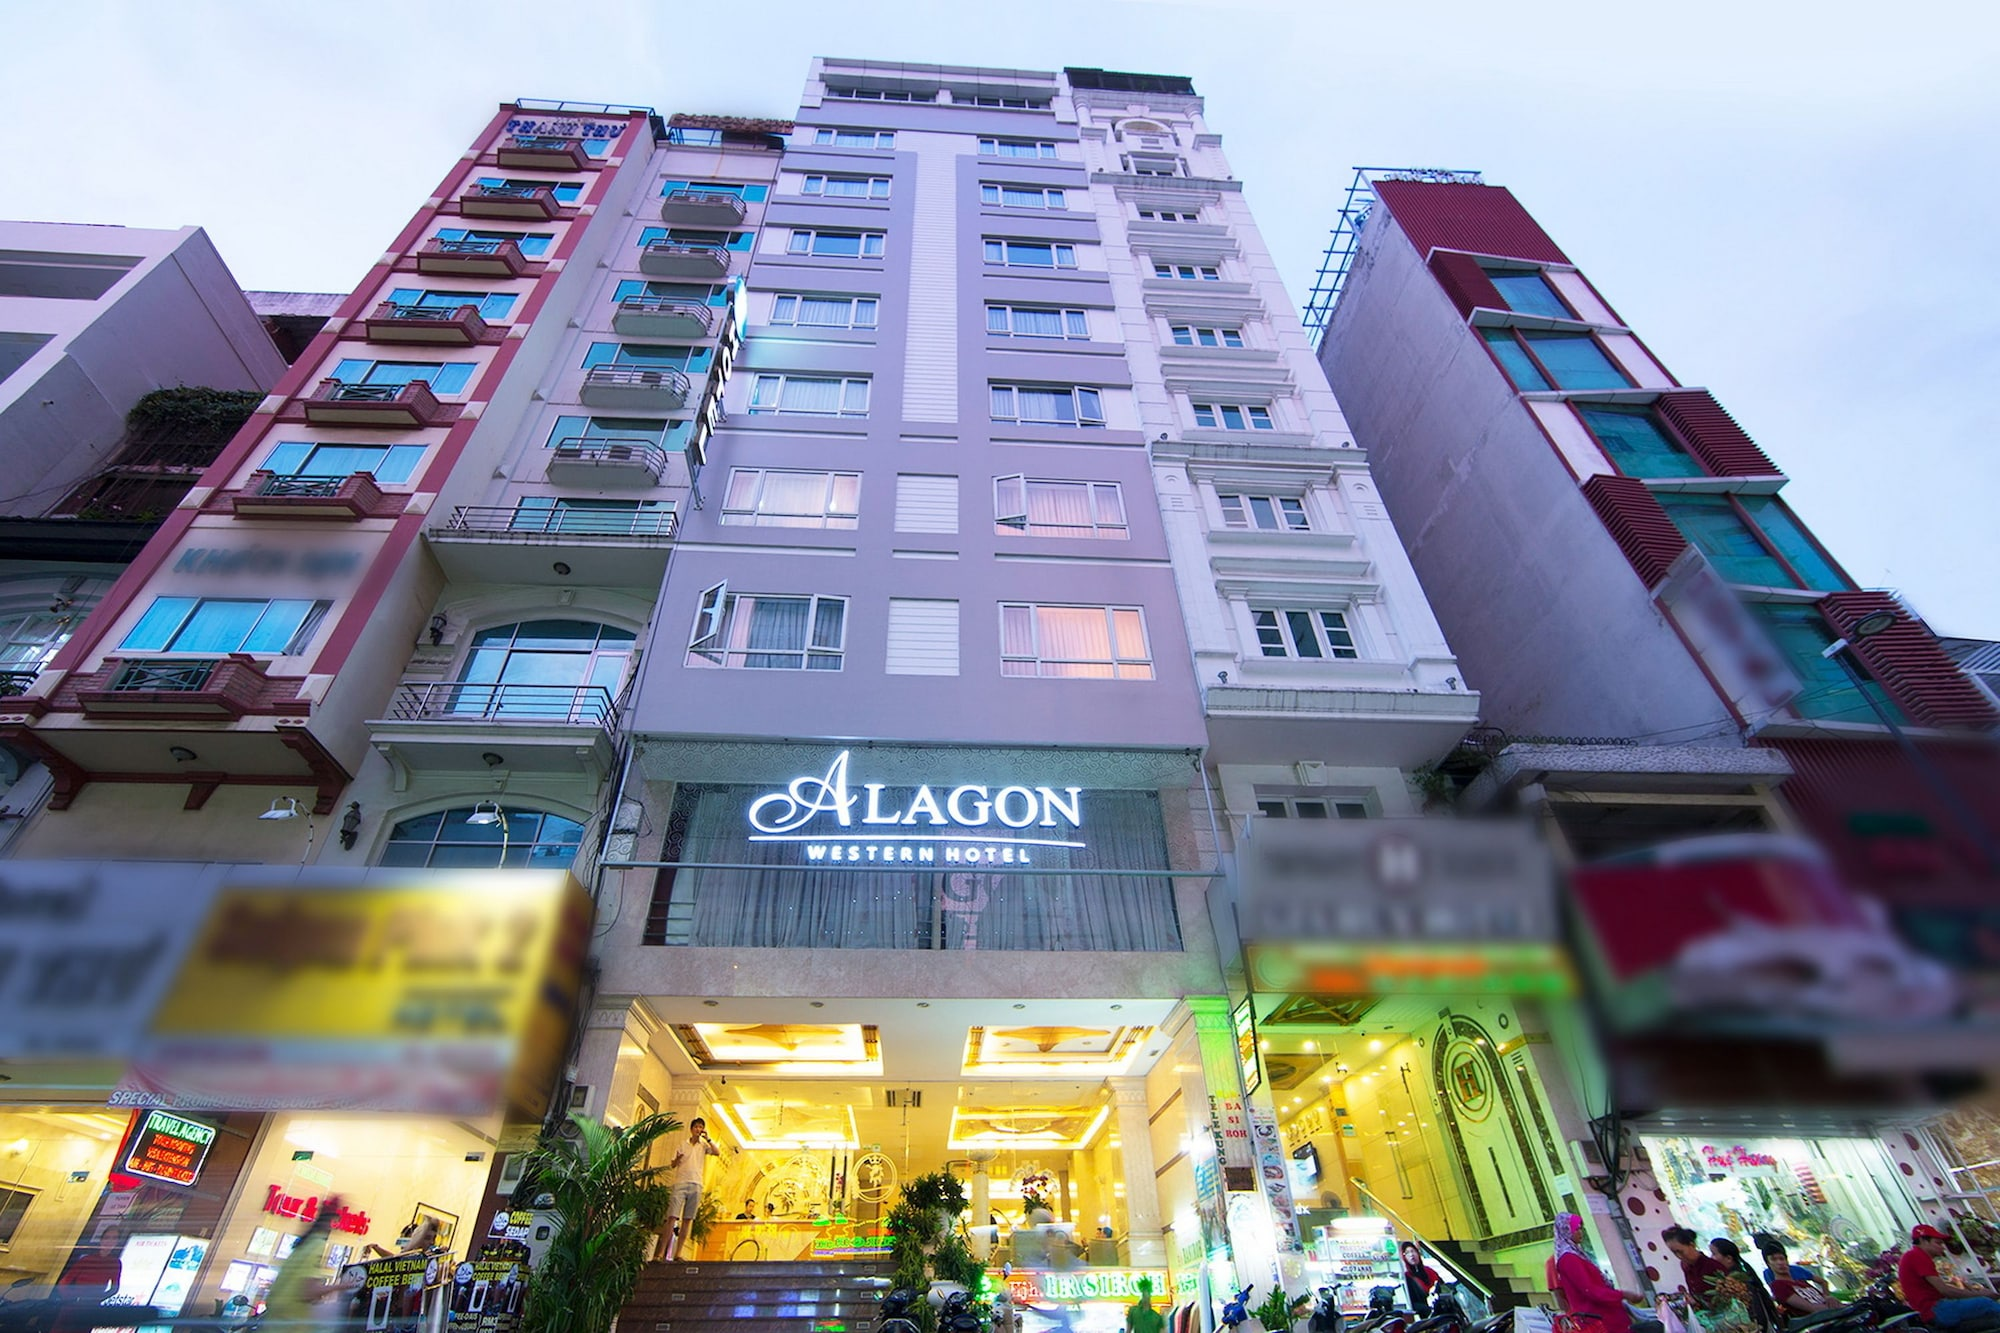 Alagon Western Hotel, Quận 1